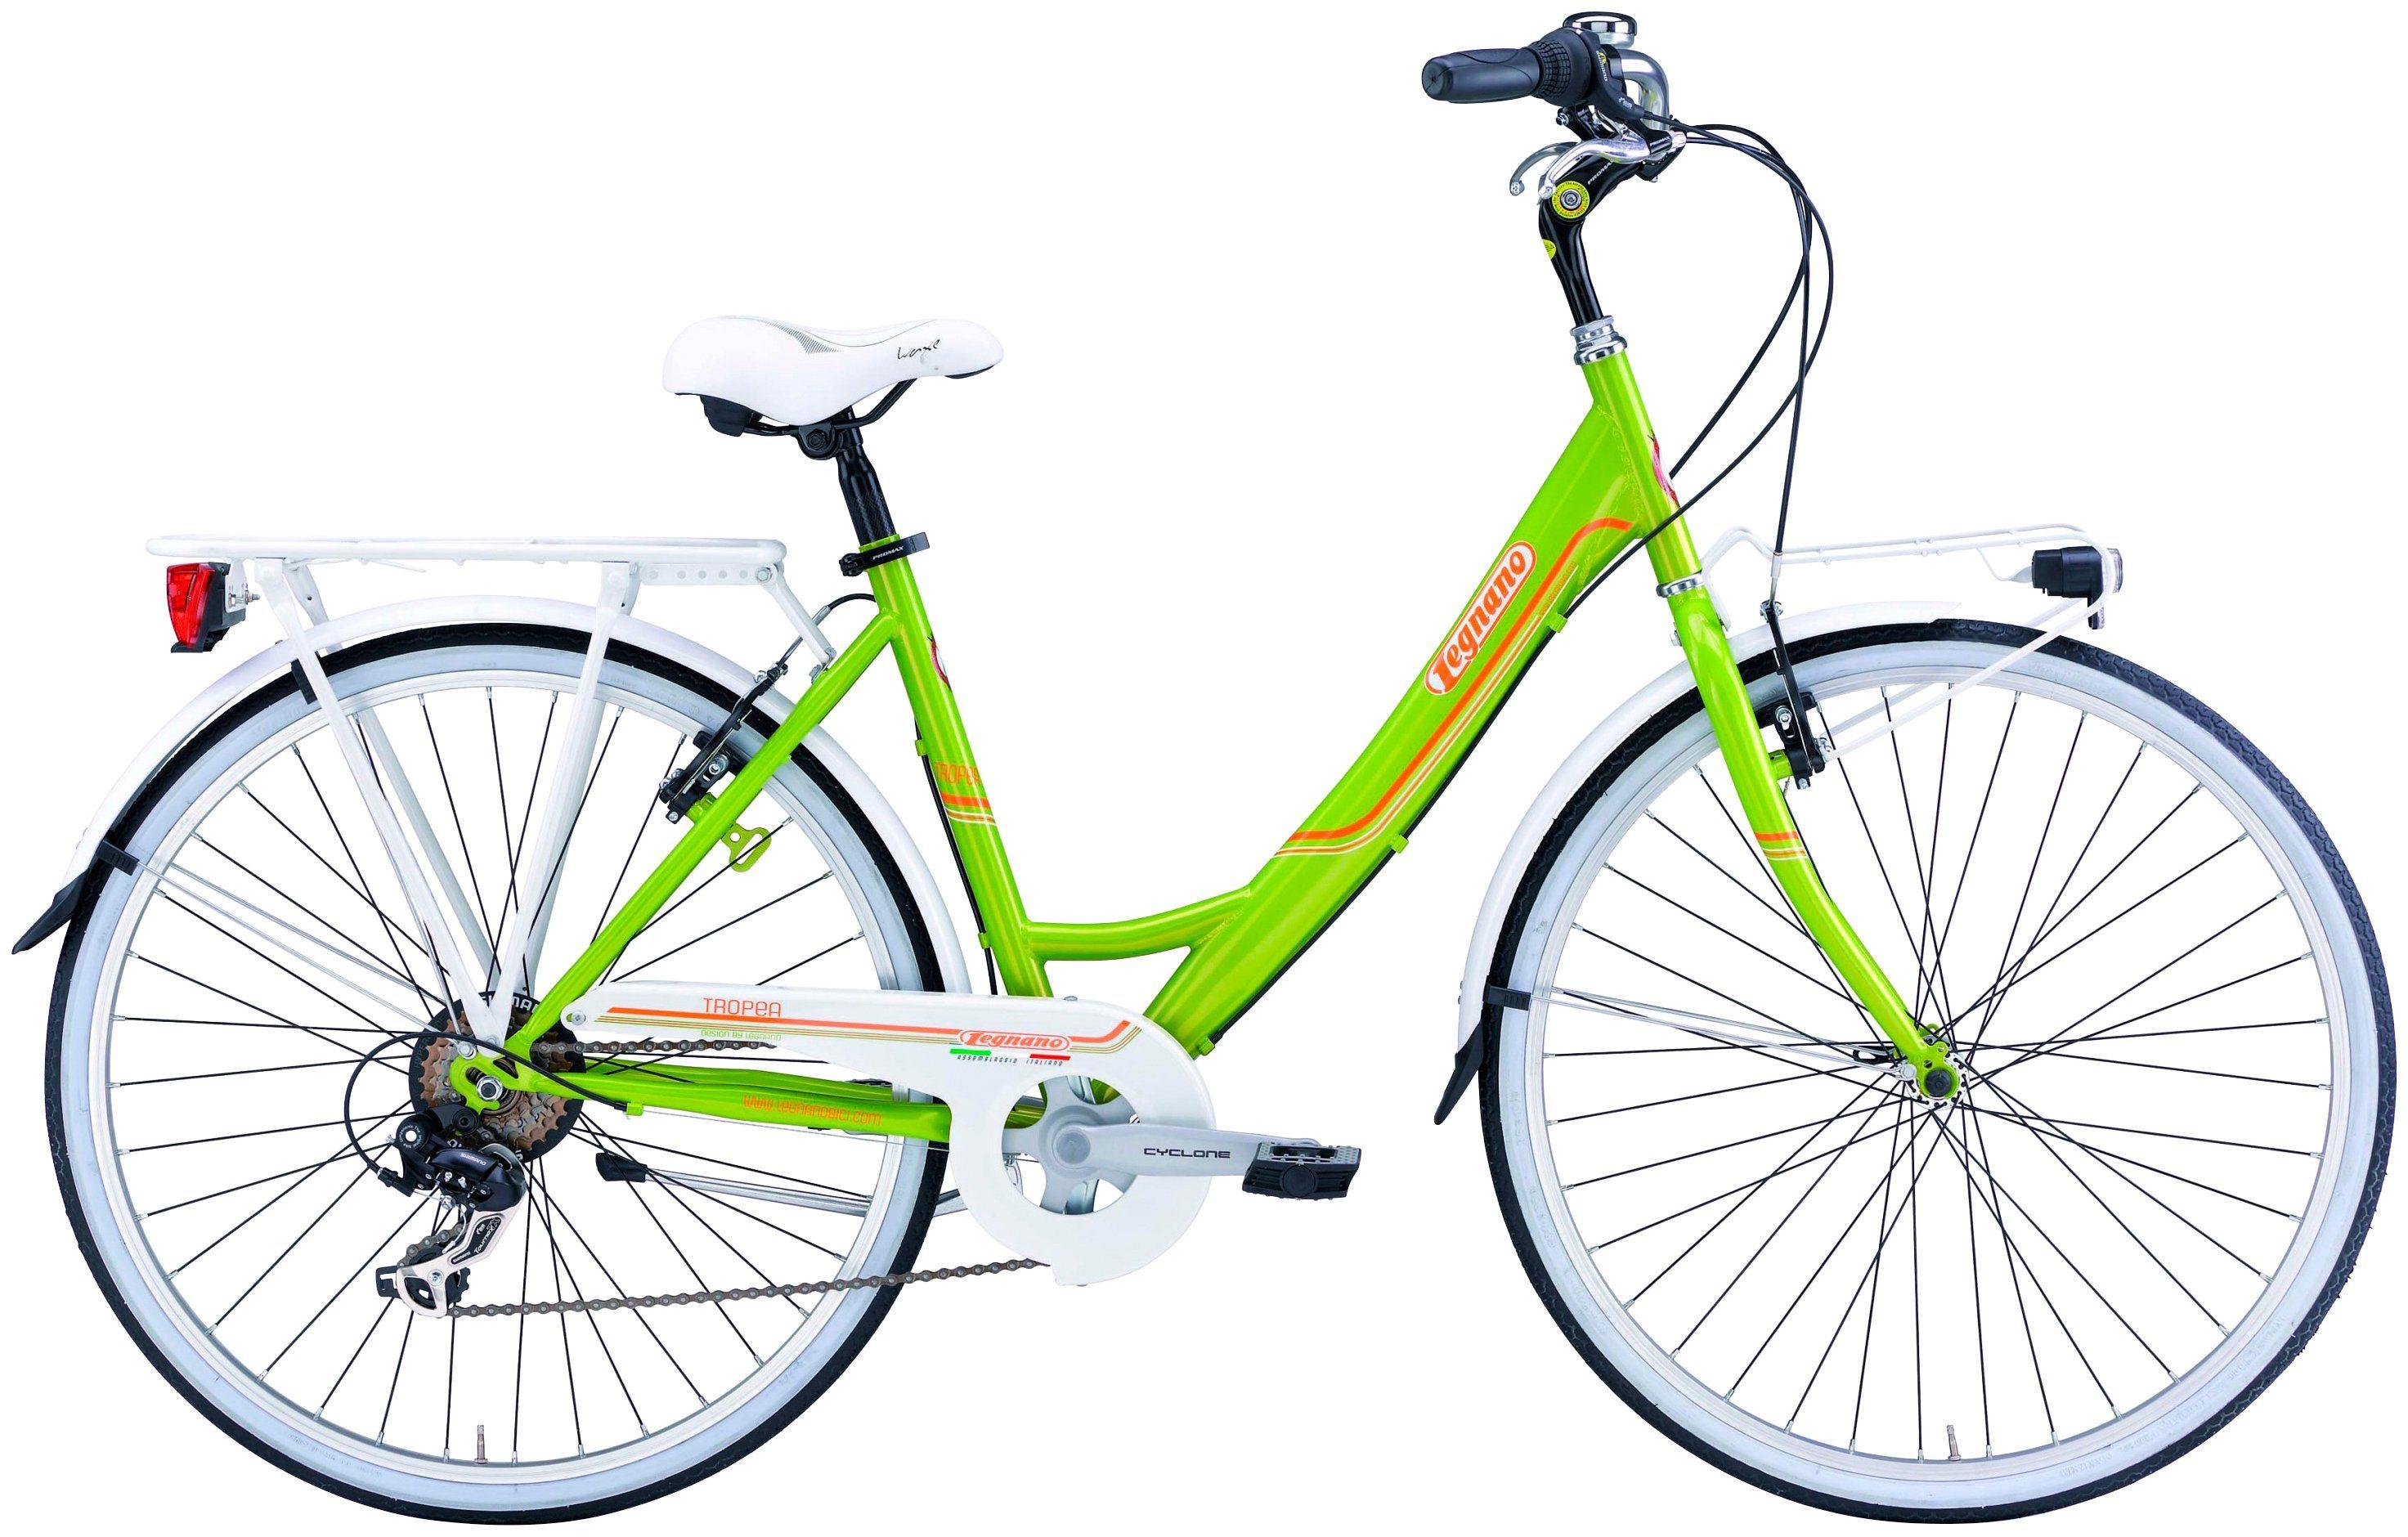 Citybike Damen »Tropea«, 26 Zoll, 6 Gang, Felgenbremse